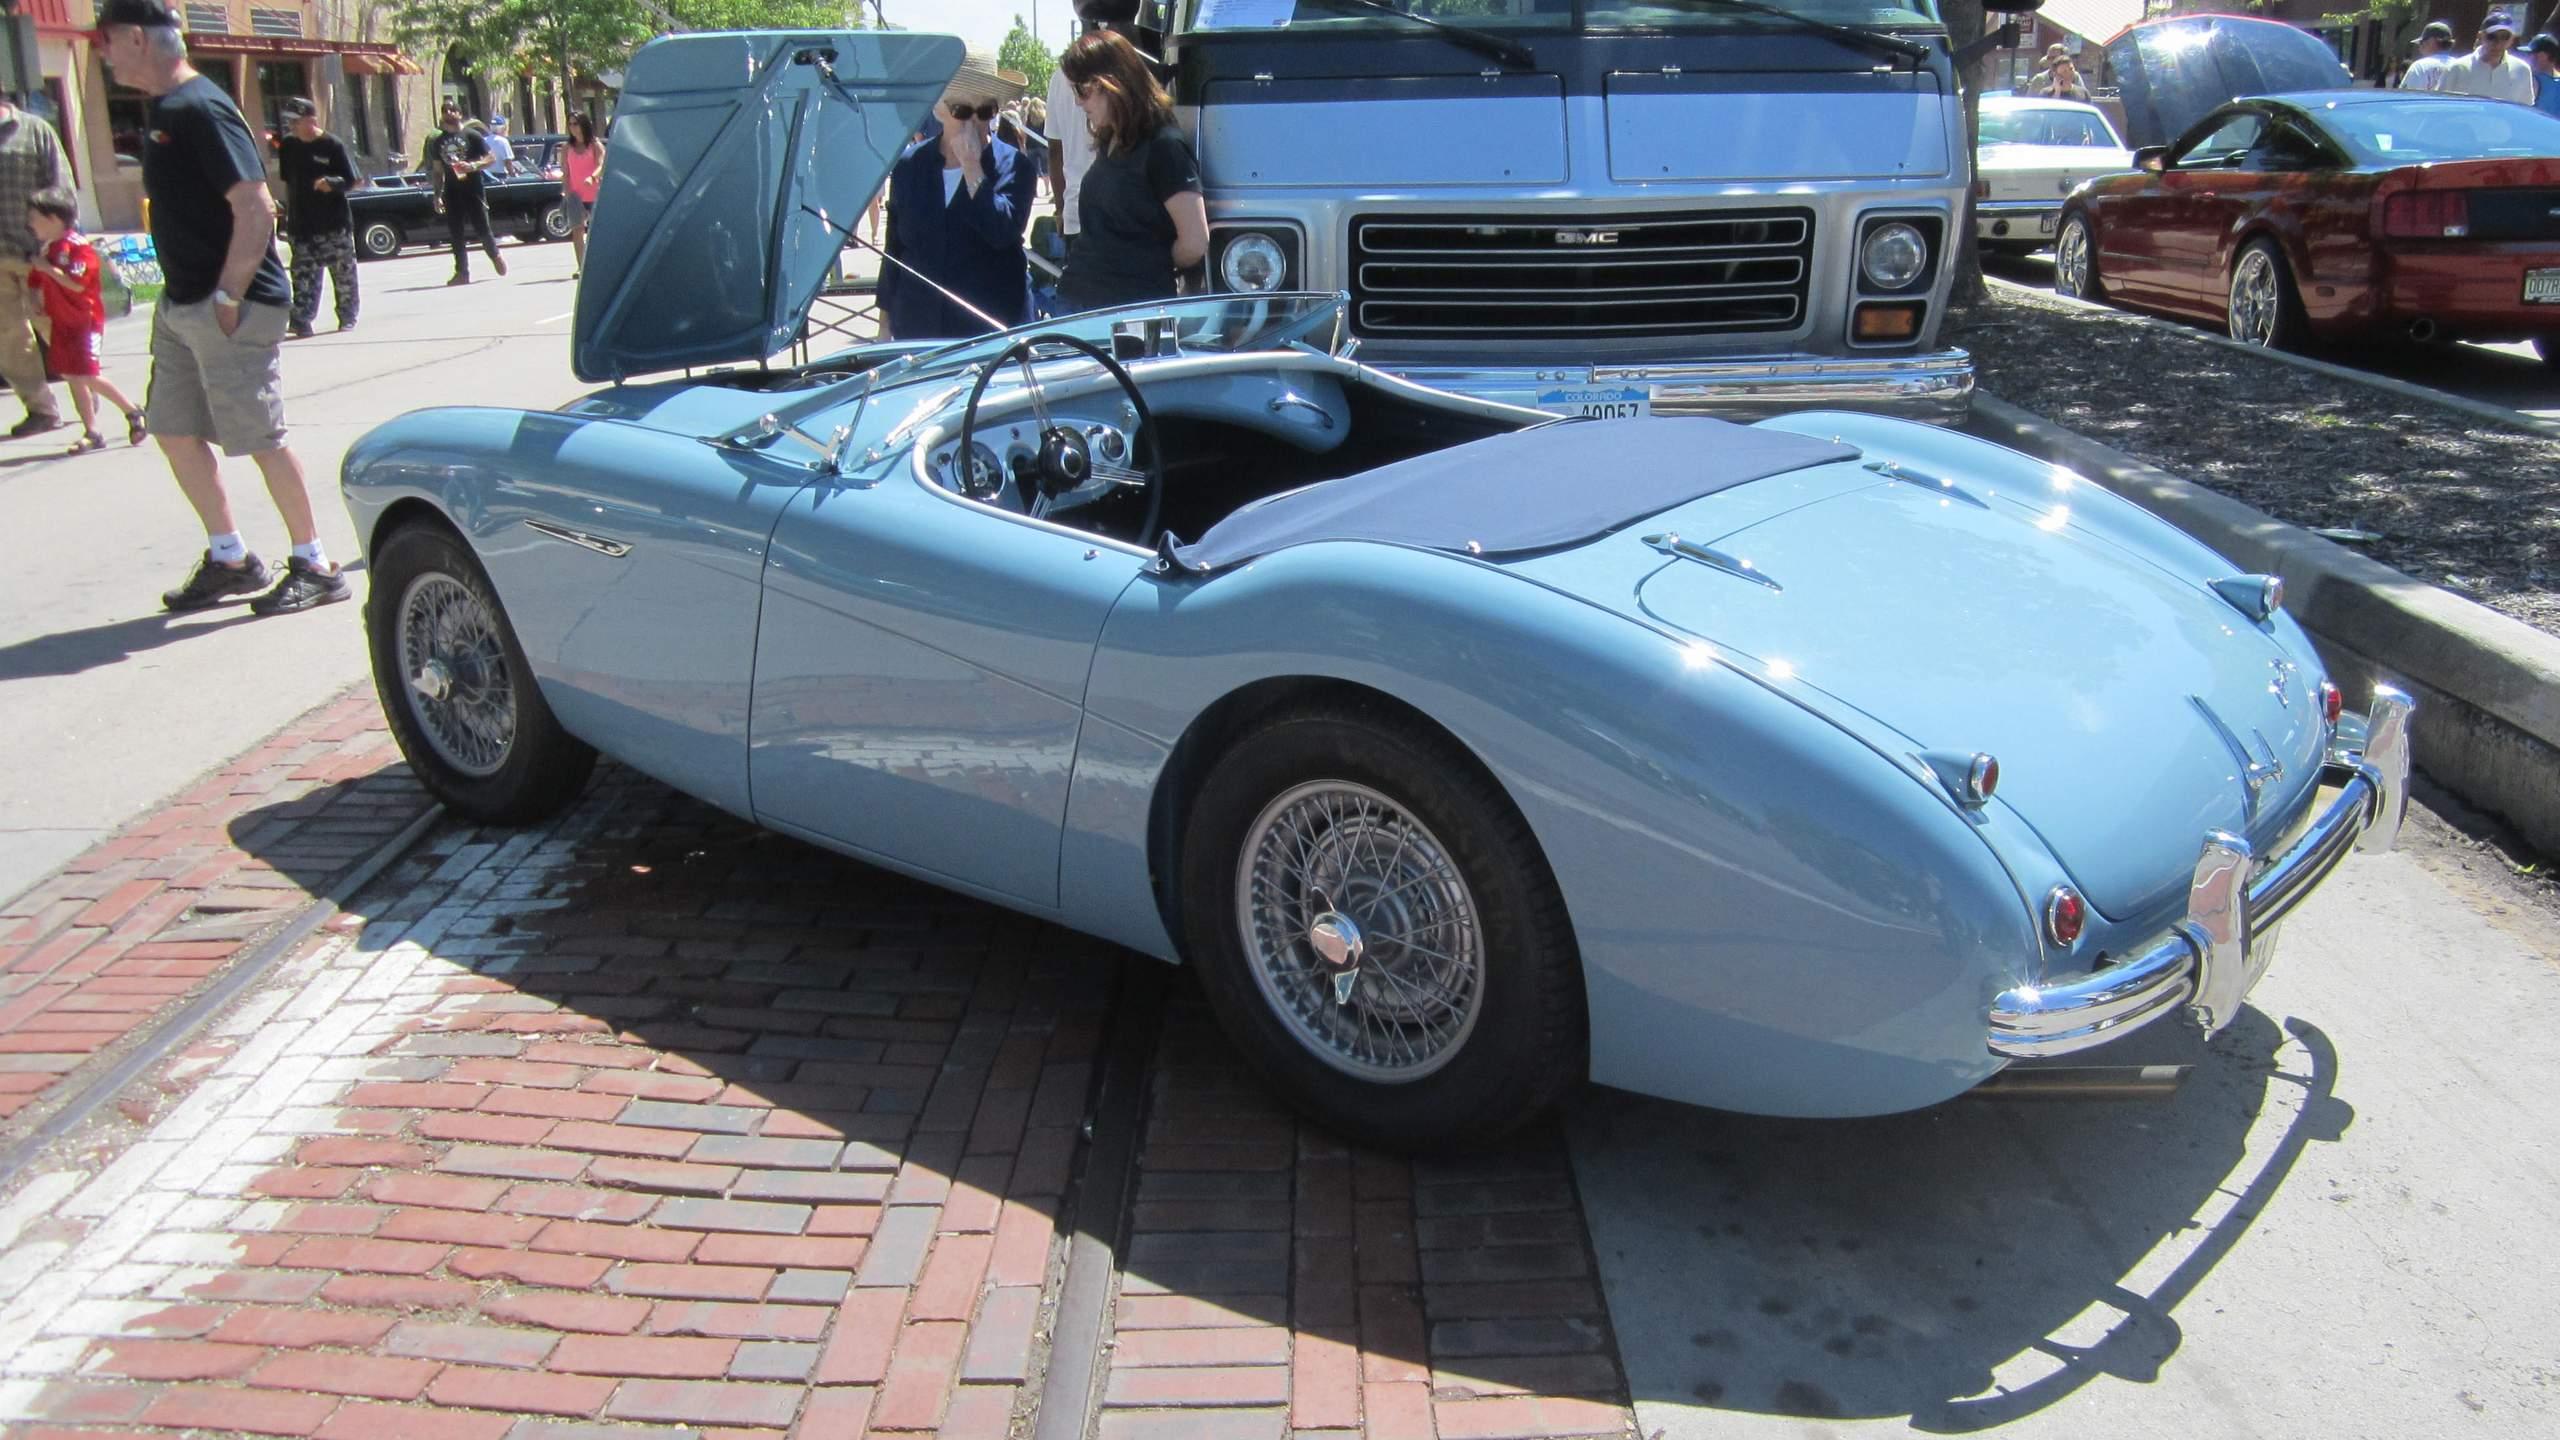 Fantastic Finish Car Wash Chatsworth Ga